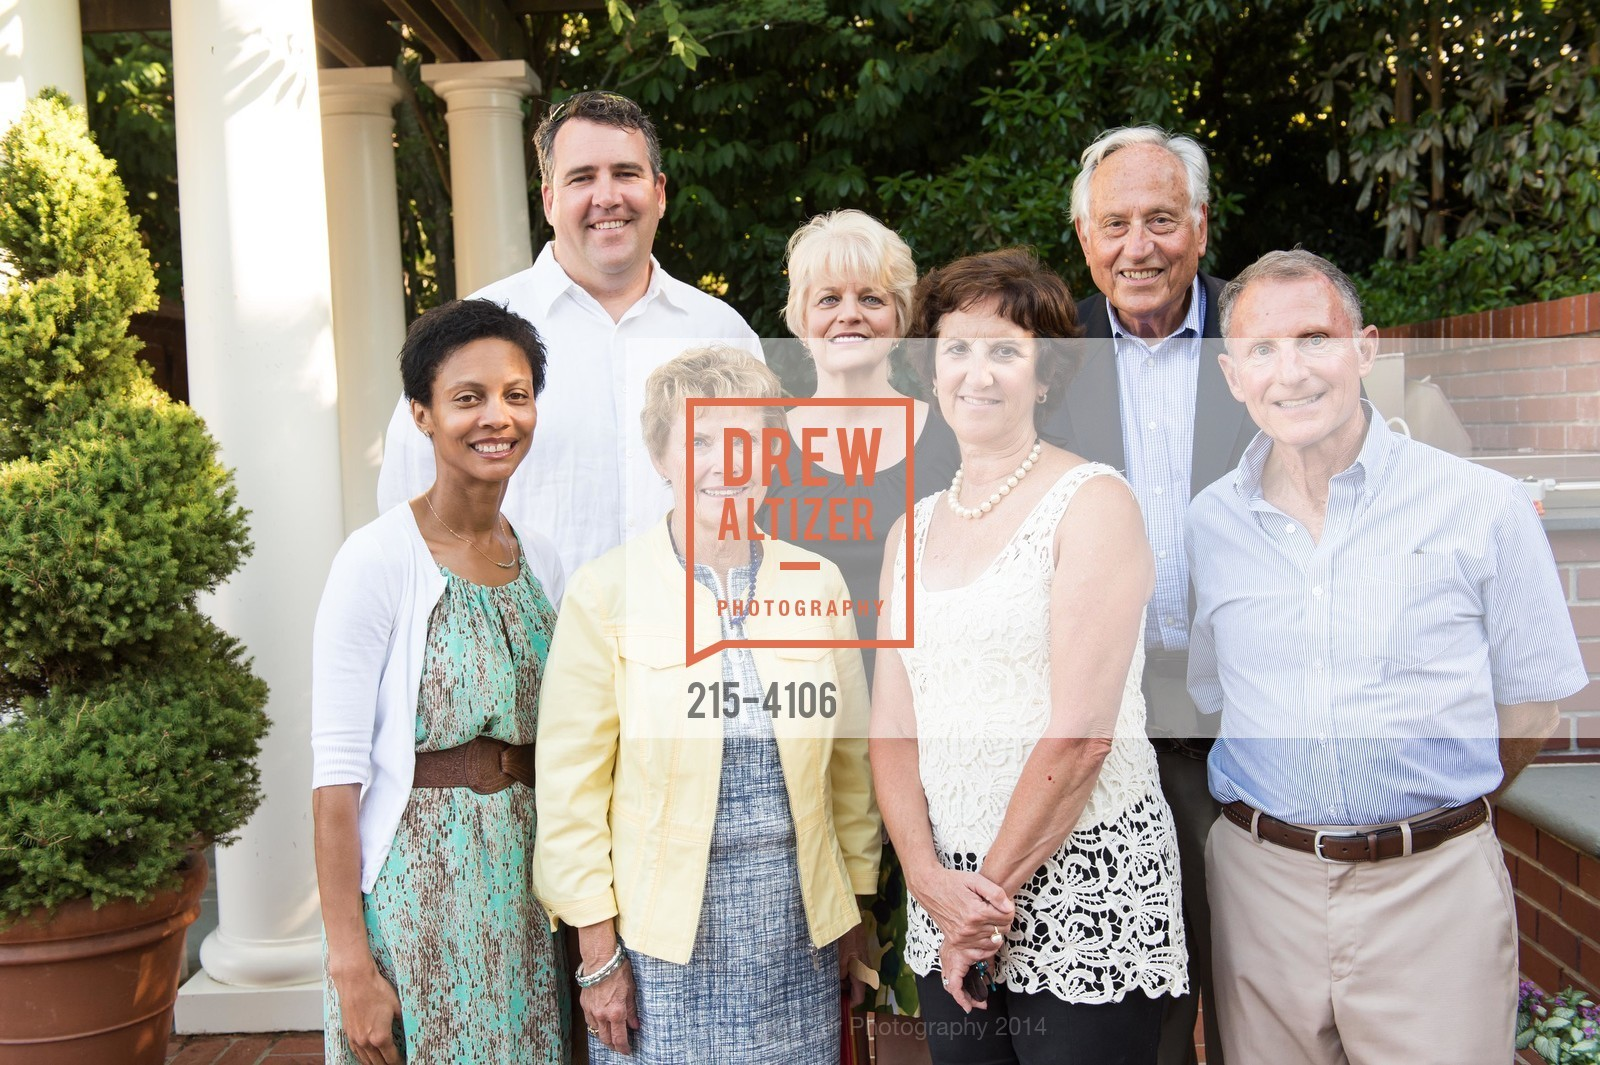 Craig Crawford, Anne Steiner, Pat Miljanich, Gayle Almeida-Hage, Martin Harband, Photo #215-4106